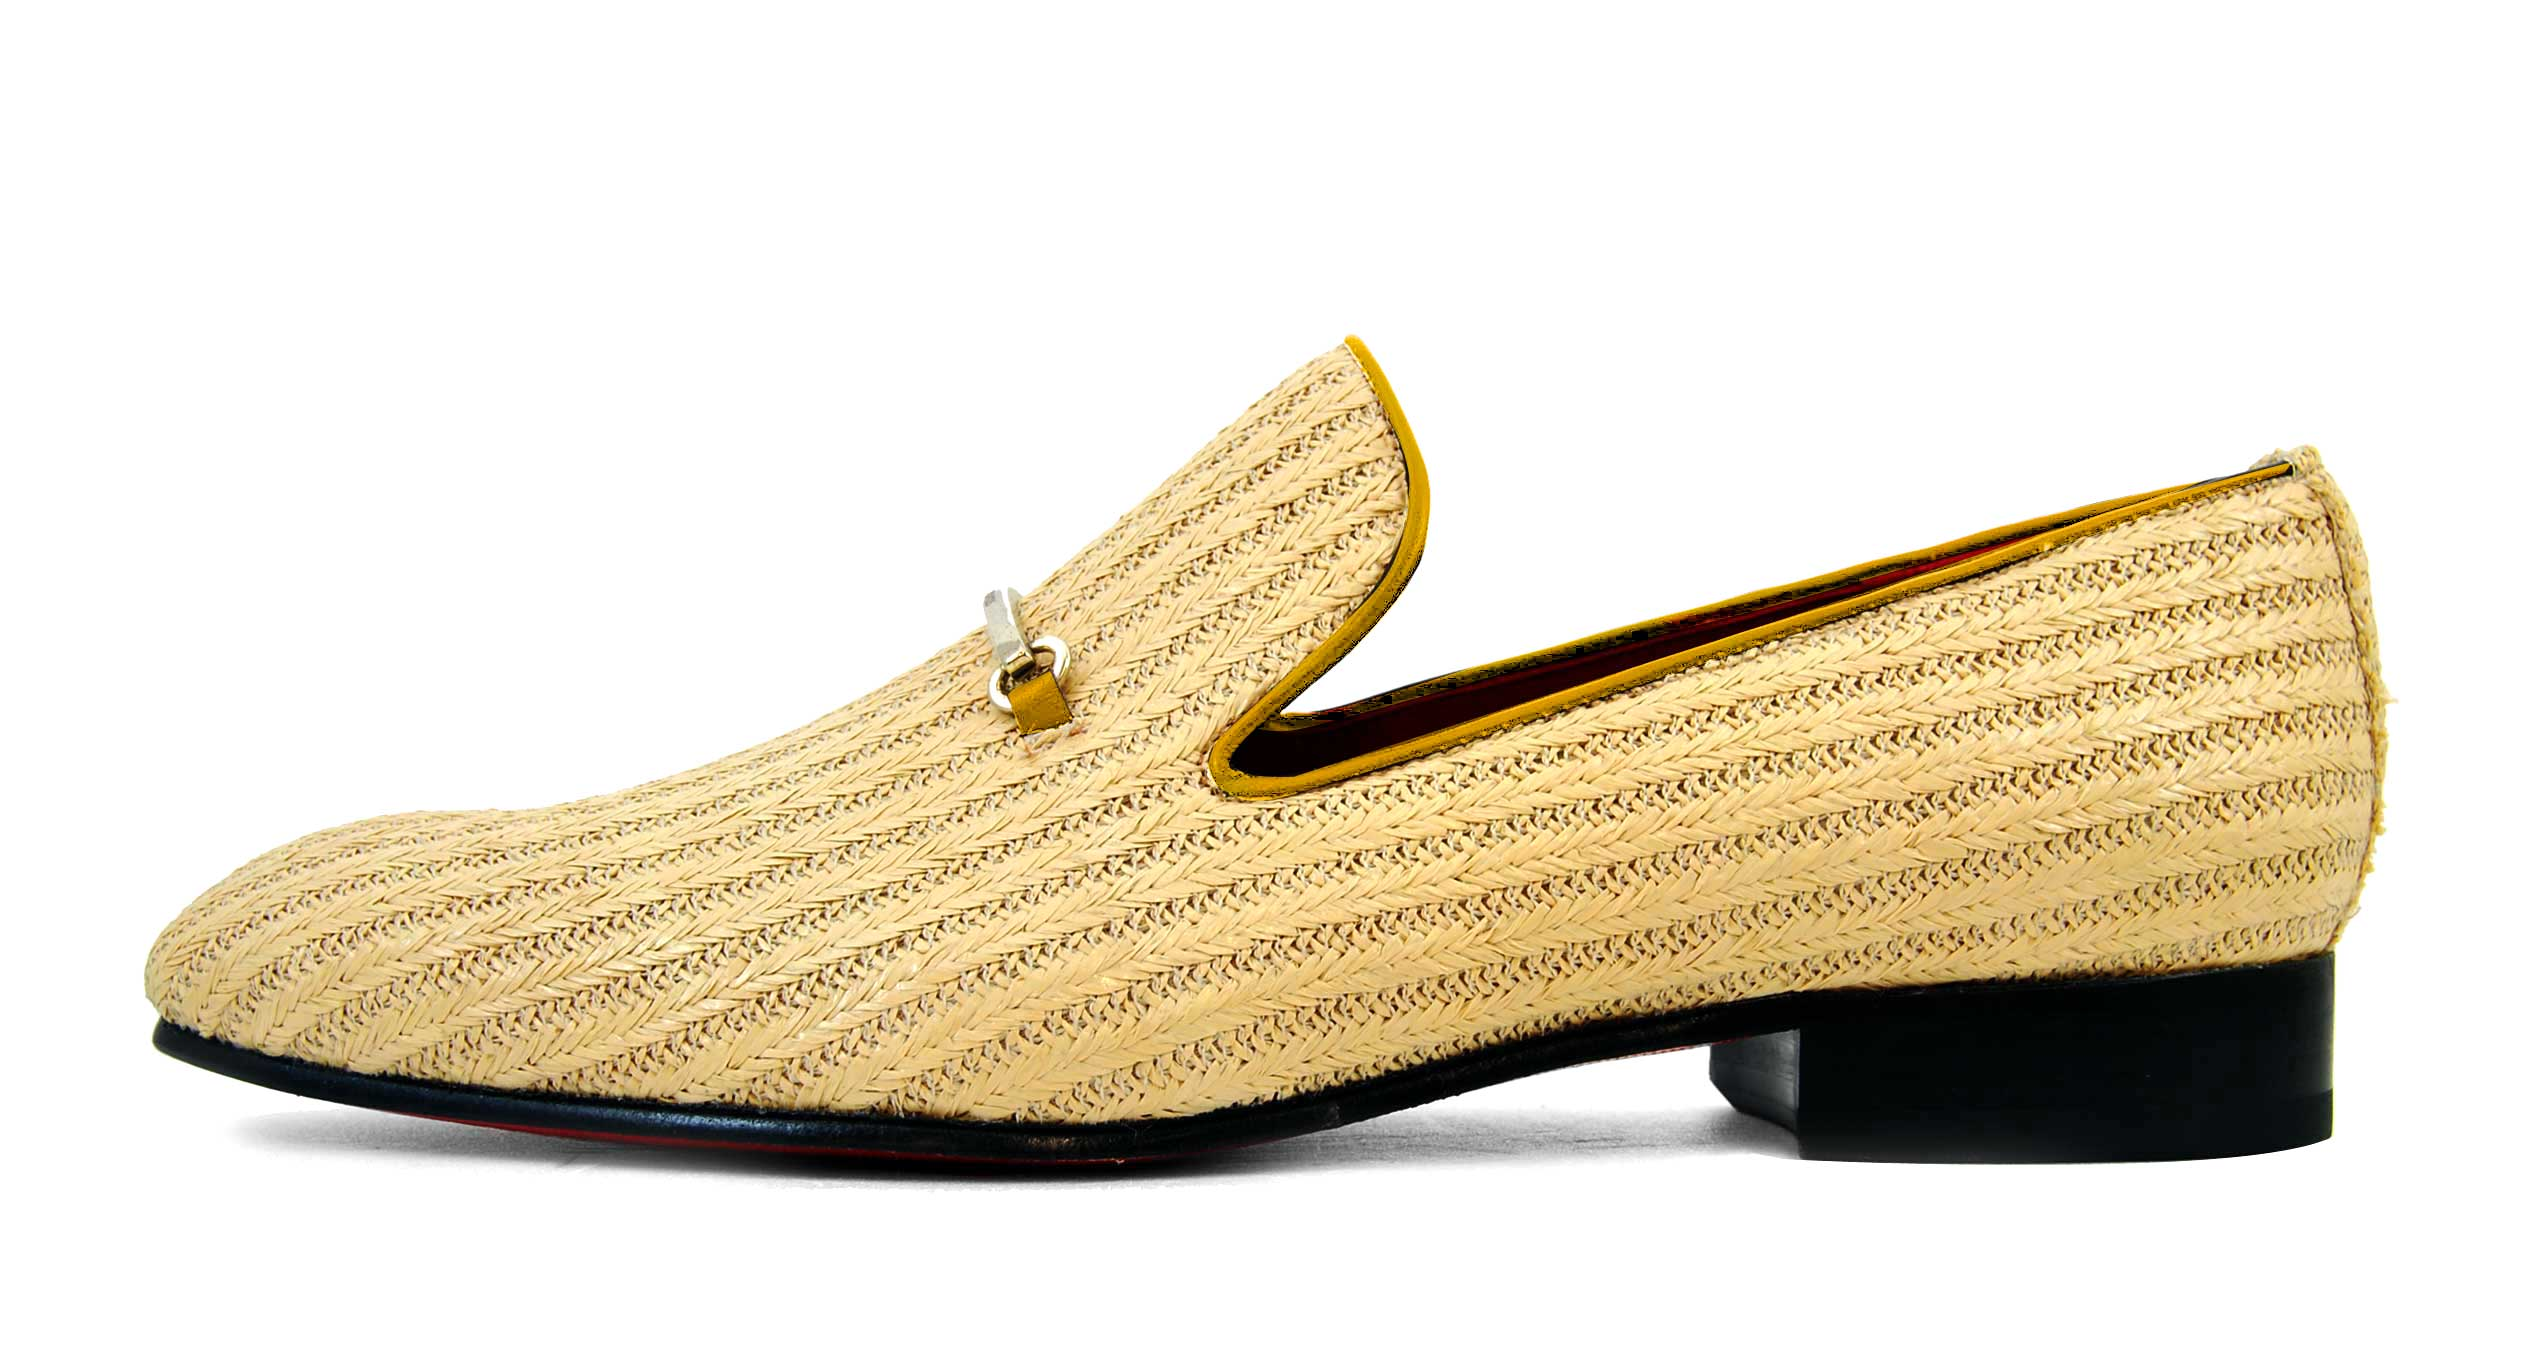 Foto 1 de Zapatos Palma Panameña Con Ribete Amarillo